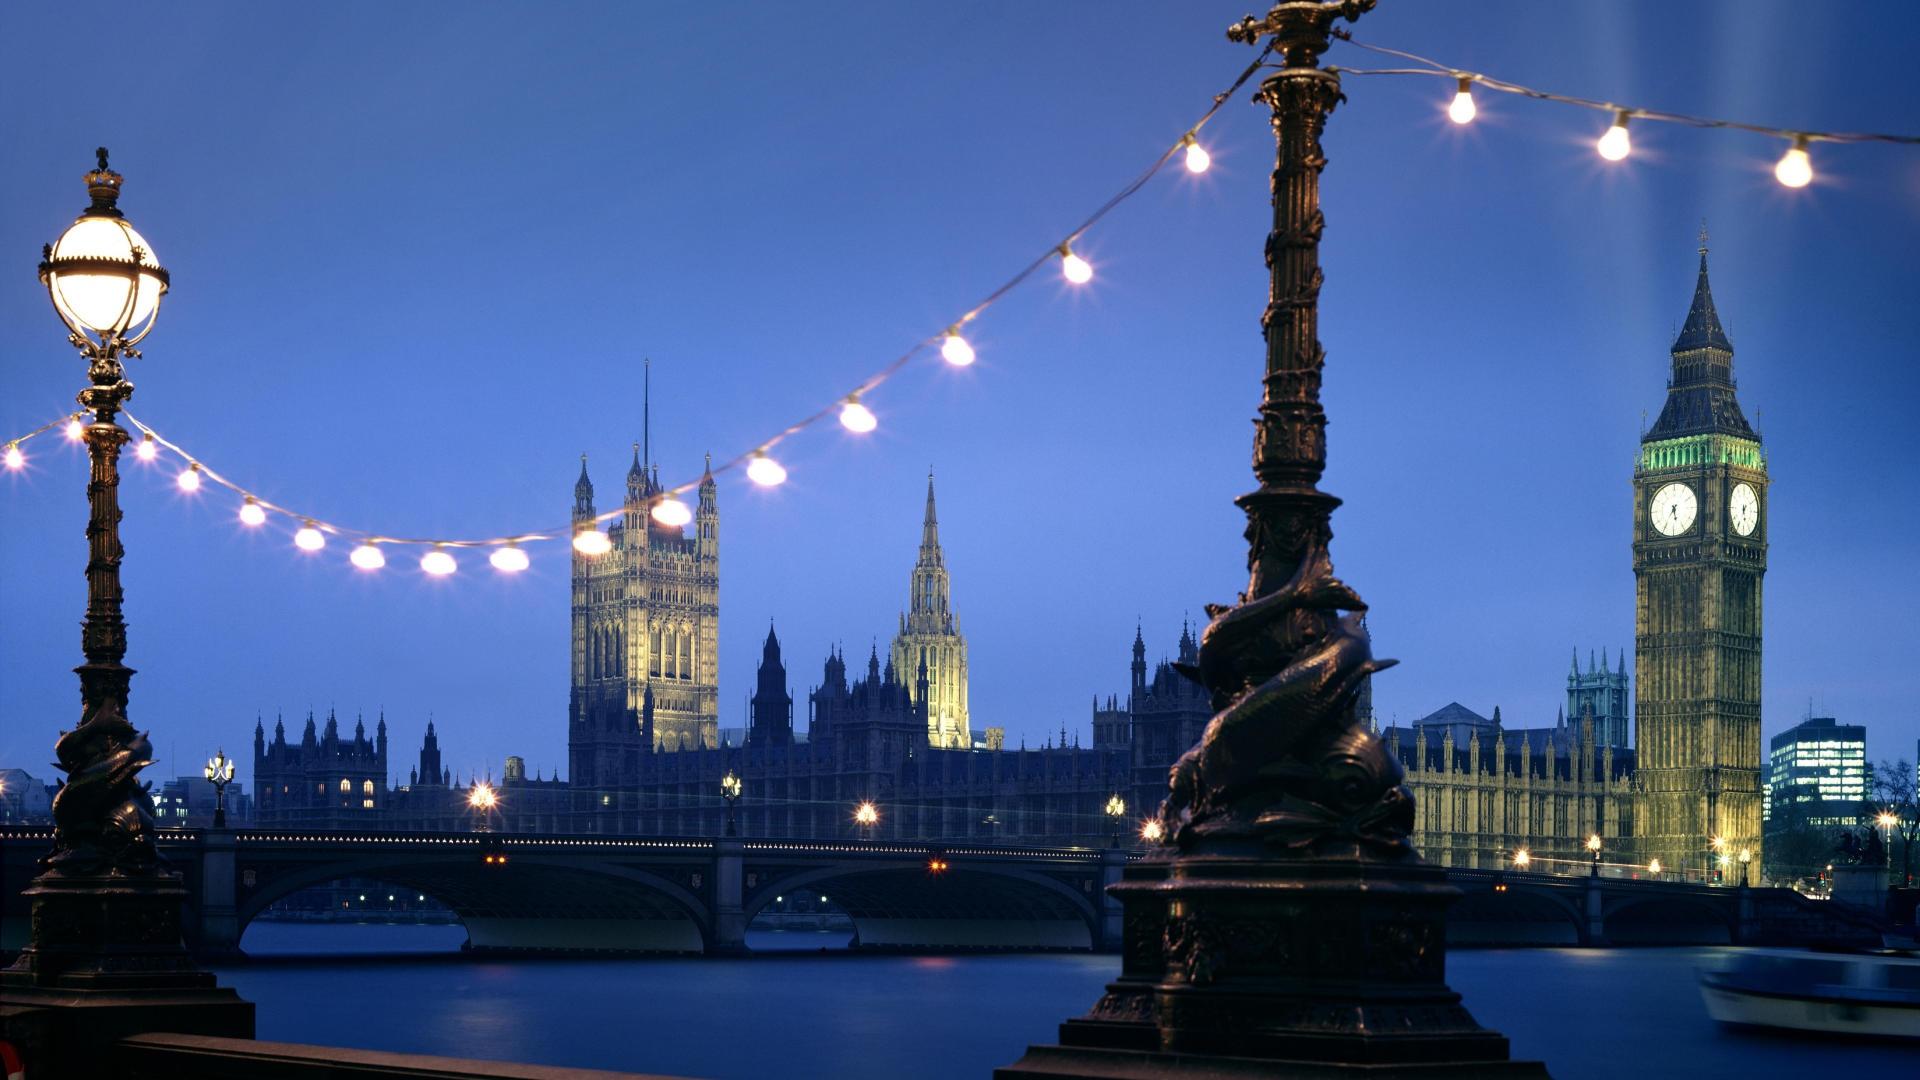 Westminster London   1920x1080 1920x1080